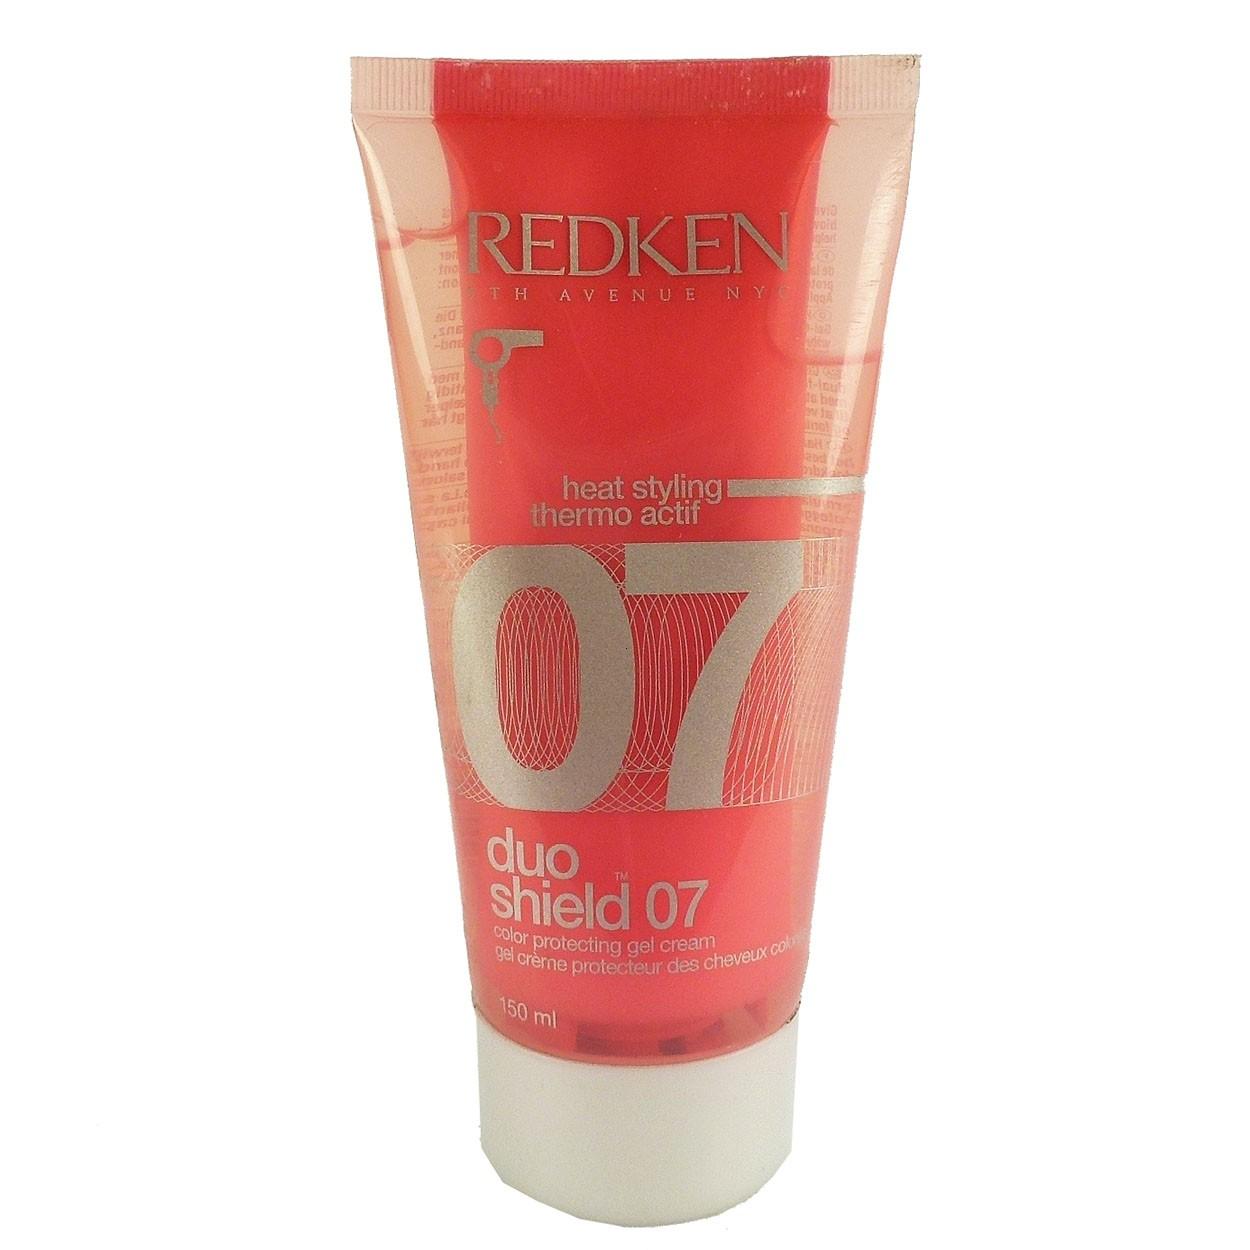 Redken Heat Styling Duo Shield 07 Gel Color Protection Gel Cream 150ml